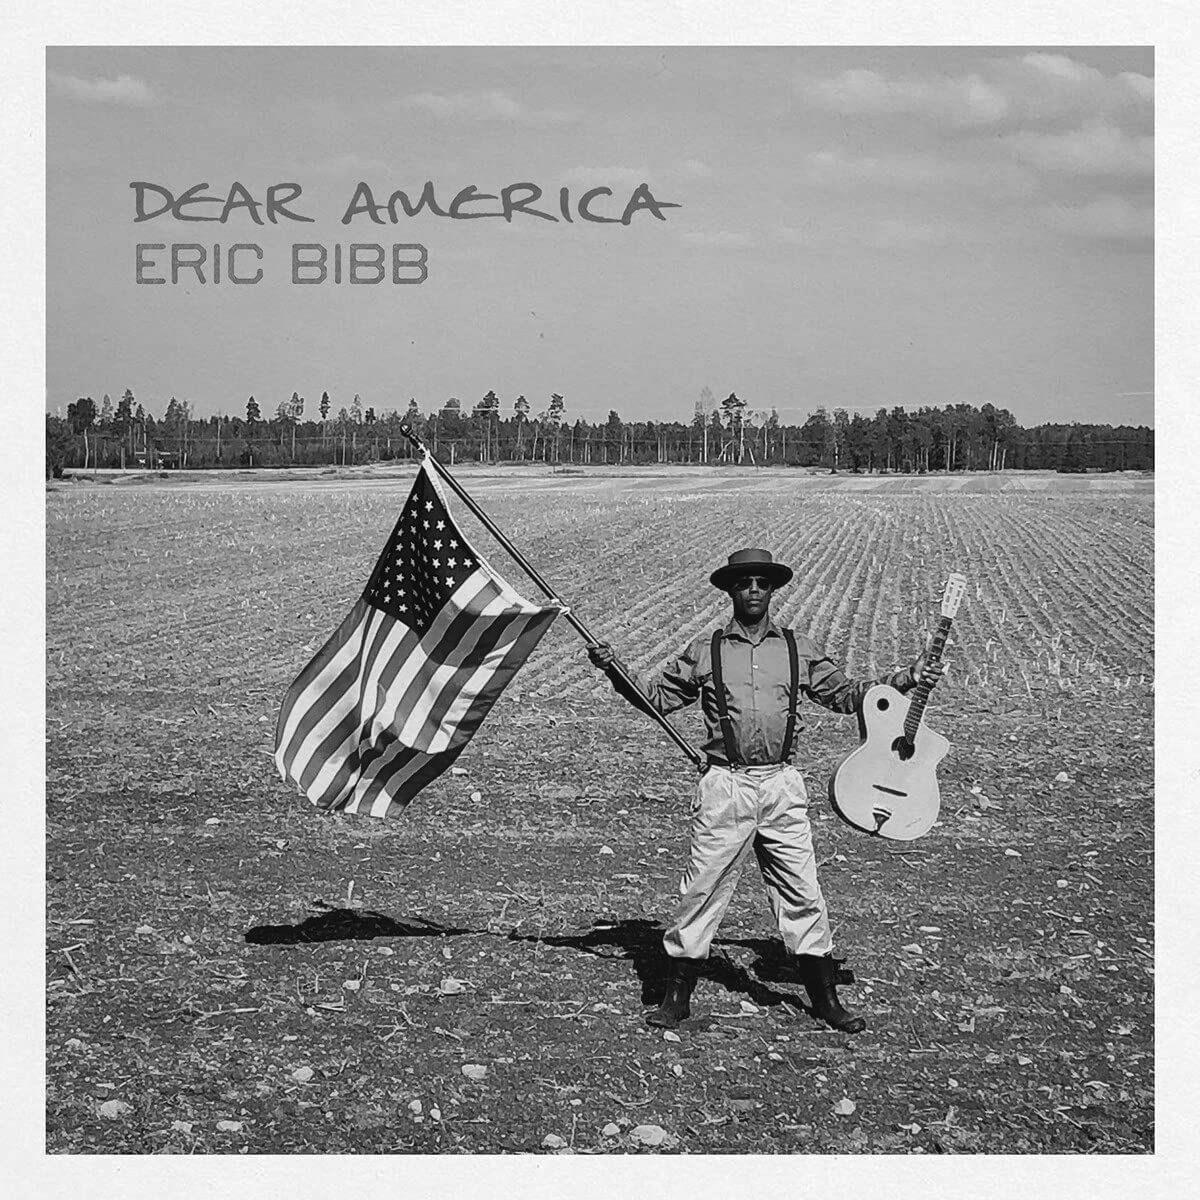 ERIC BIBB Dear America cover album